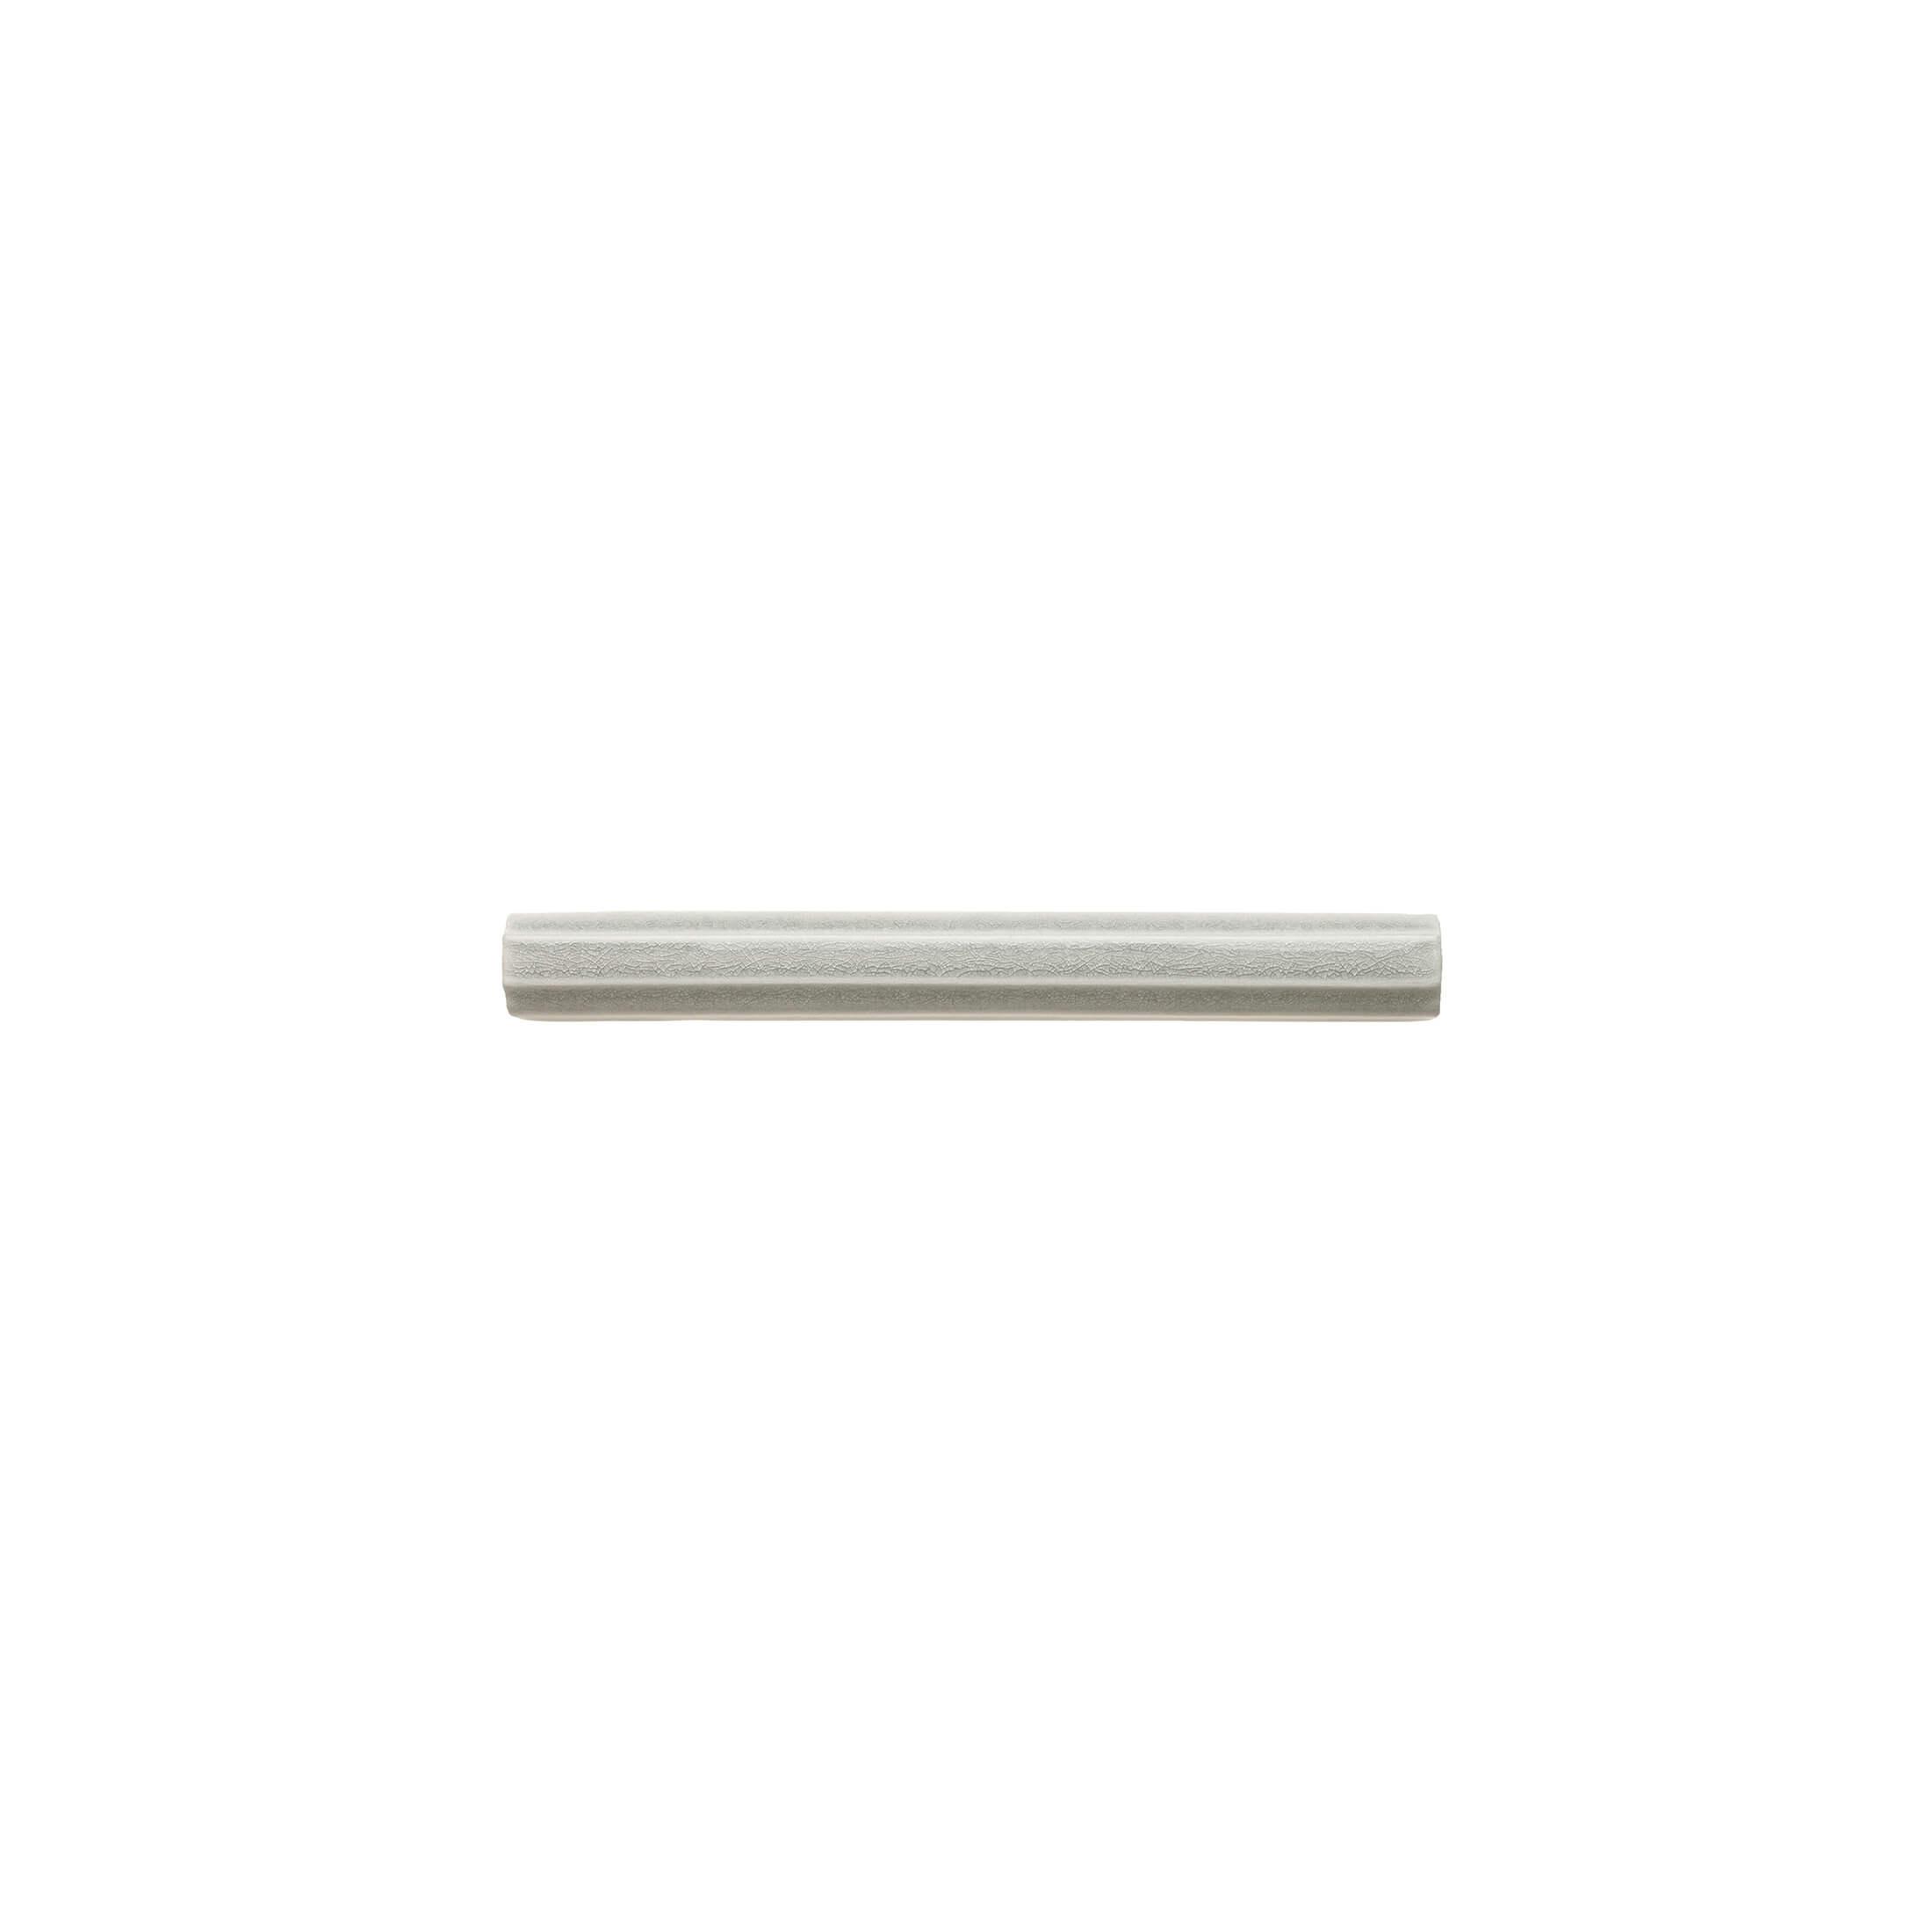 ADOC5046 - LISTELO  - 1.7 cm X 15 cm